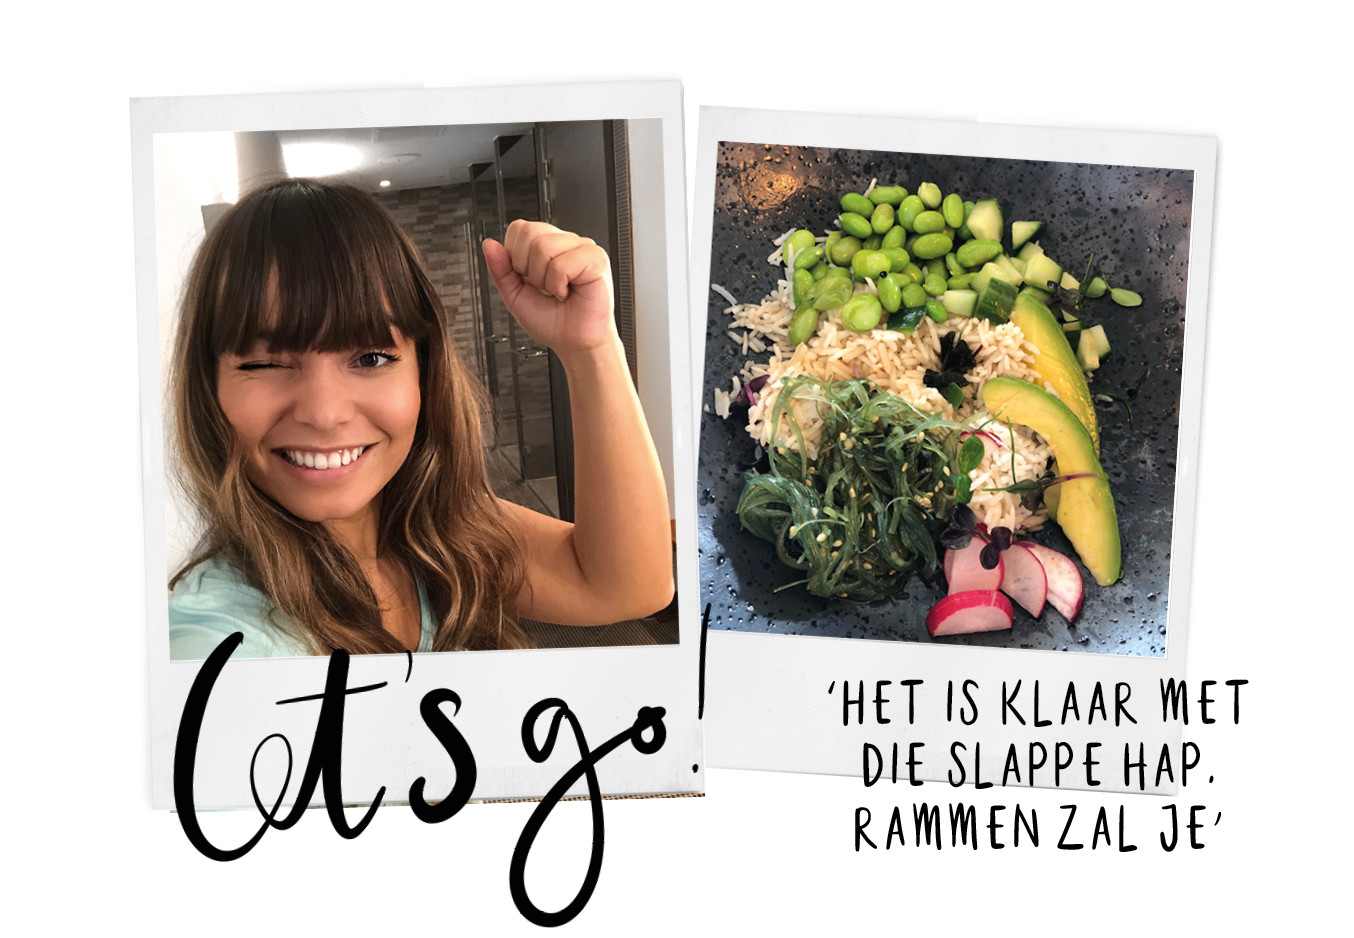 kiki's dieetdagboek